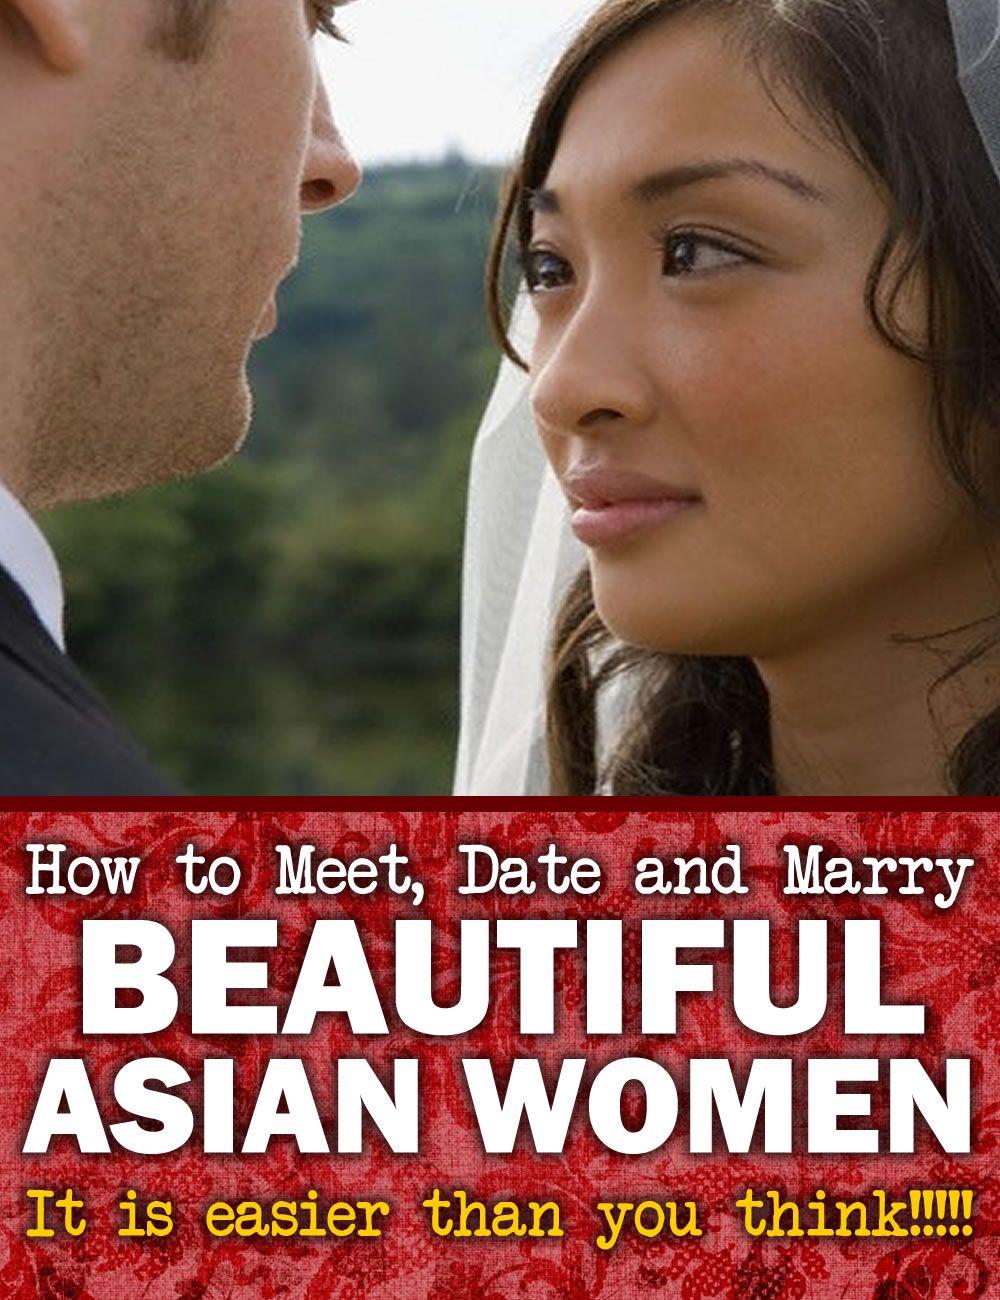 Meet Date Marry Beatiful Woman